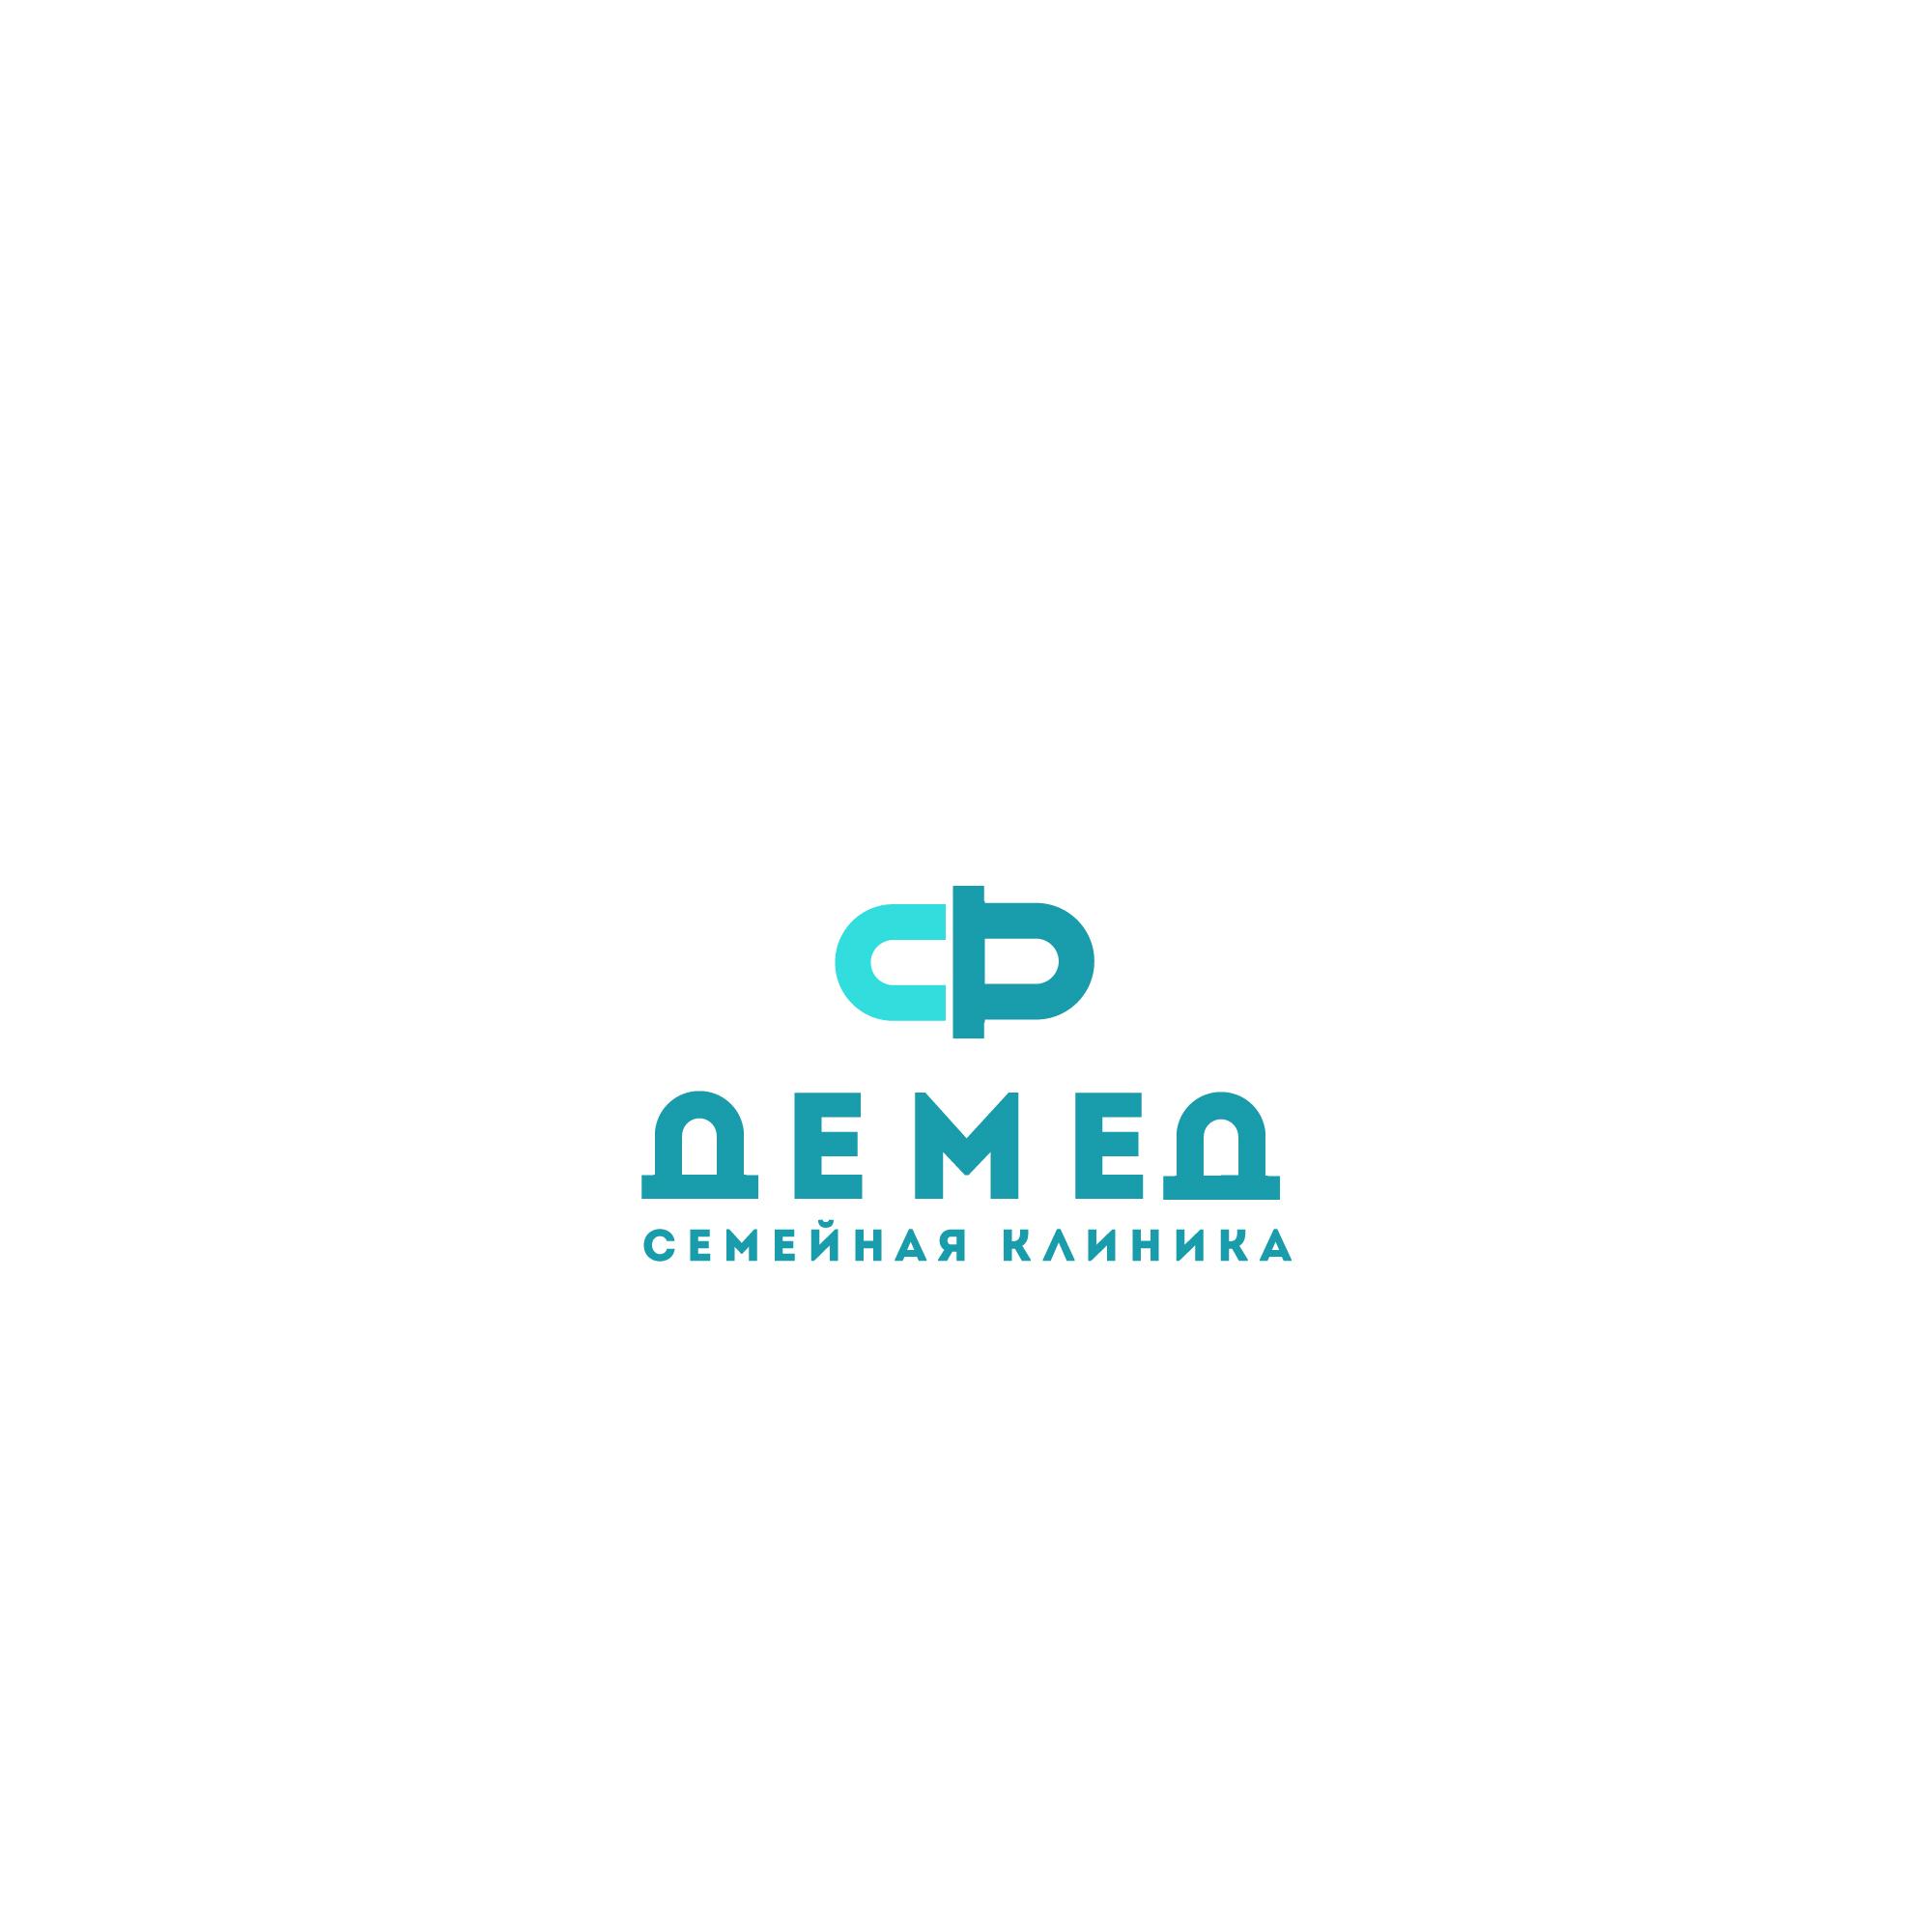 Логотип медицинского центра фото f_5575dcd59912dd4a.jpg